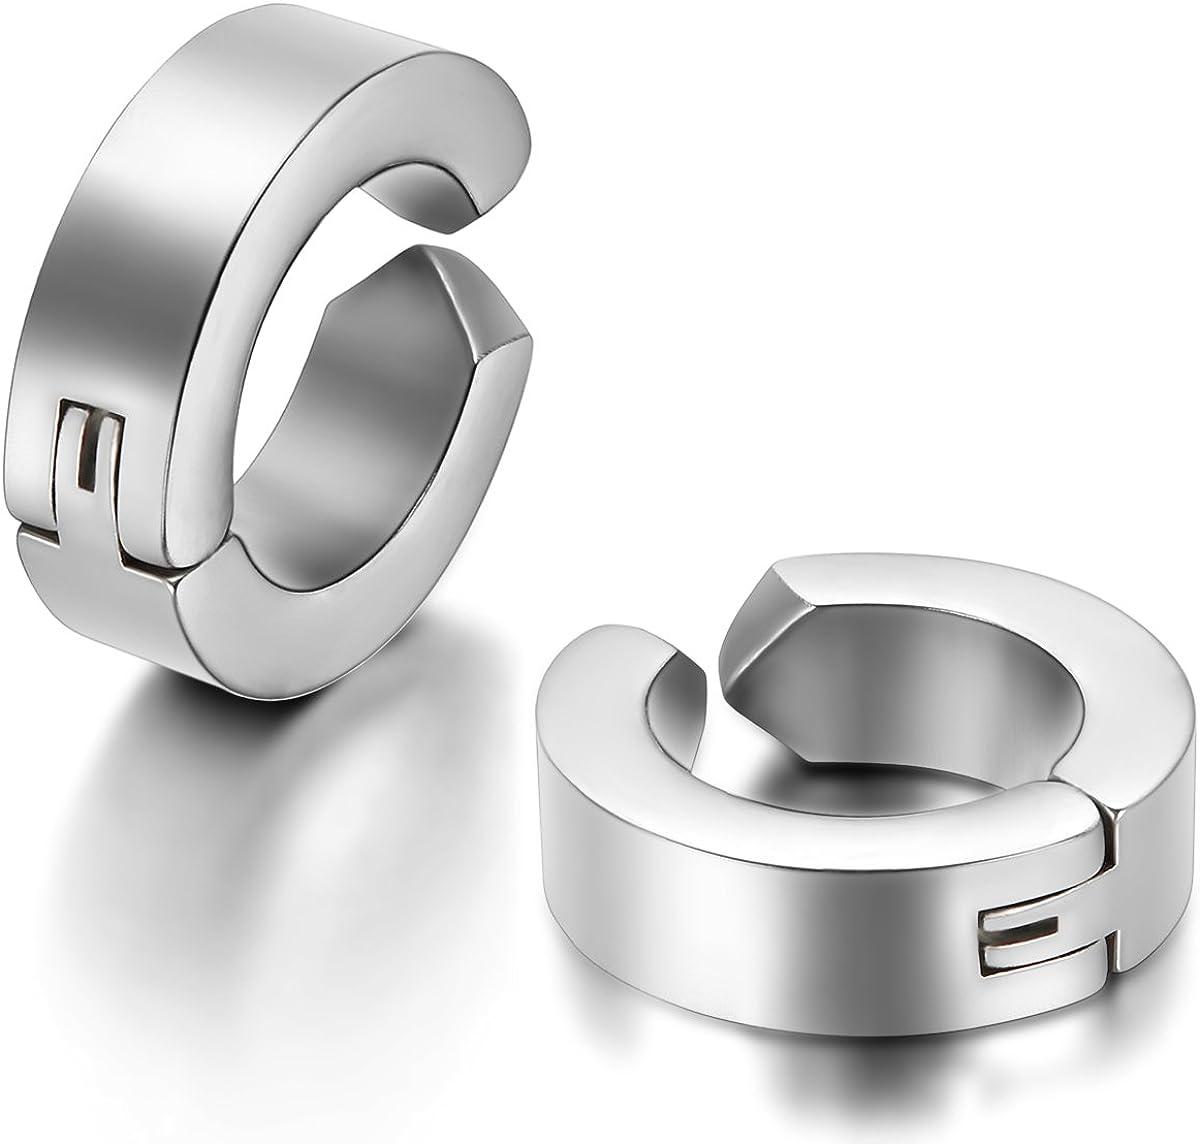 JewelryWe Schmuck 2x Creolen Edelstahl ohne Loch Fake Ohrstecker Ohrclips Klappcreolen Huggie 4mm Silber Schwarz